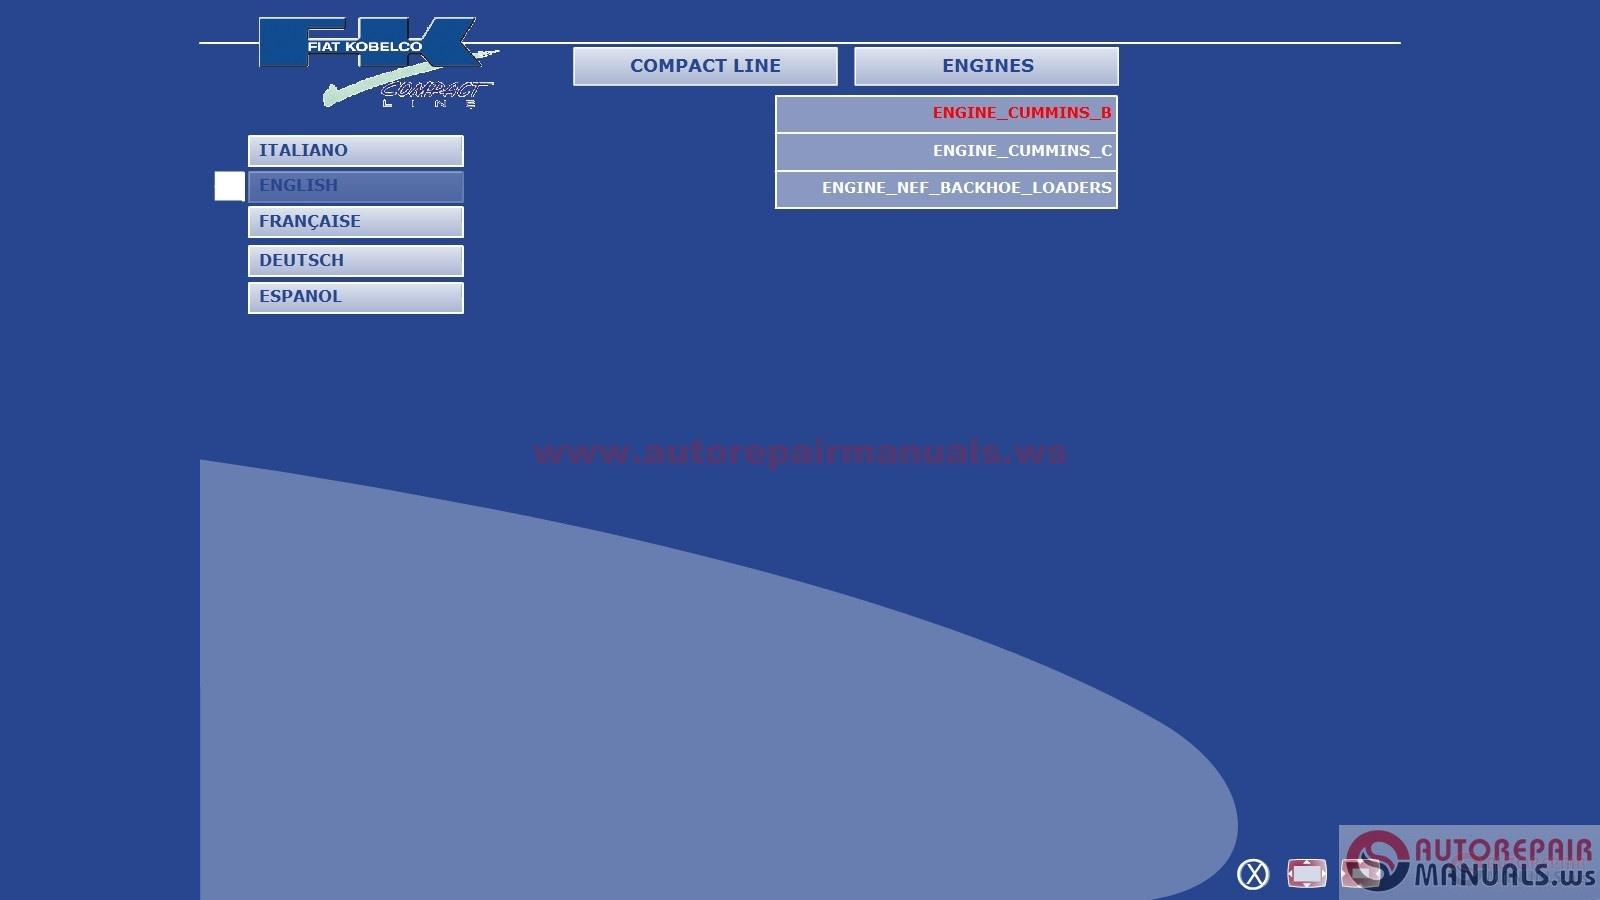 Cd Training Manual Fiat Kobelco Compact Line Engine Auto Repair Loader Wiring Diagram Img